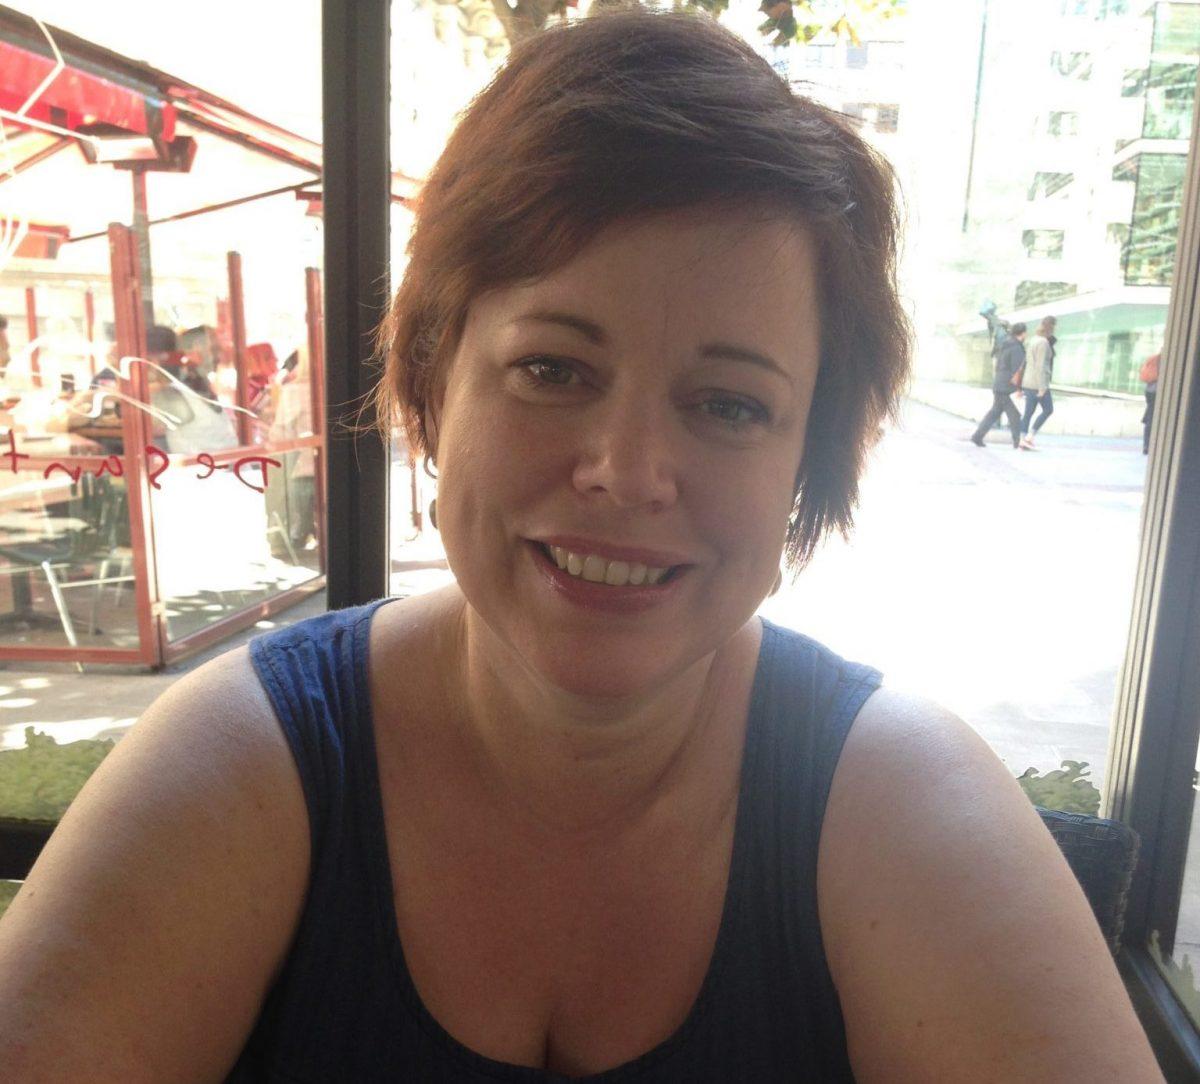 Nicola-Tyne-e1528367693548.jpg